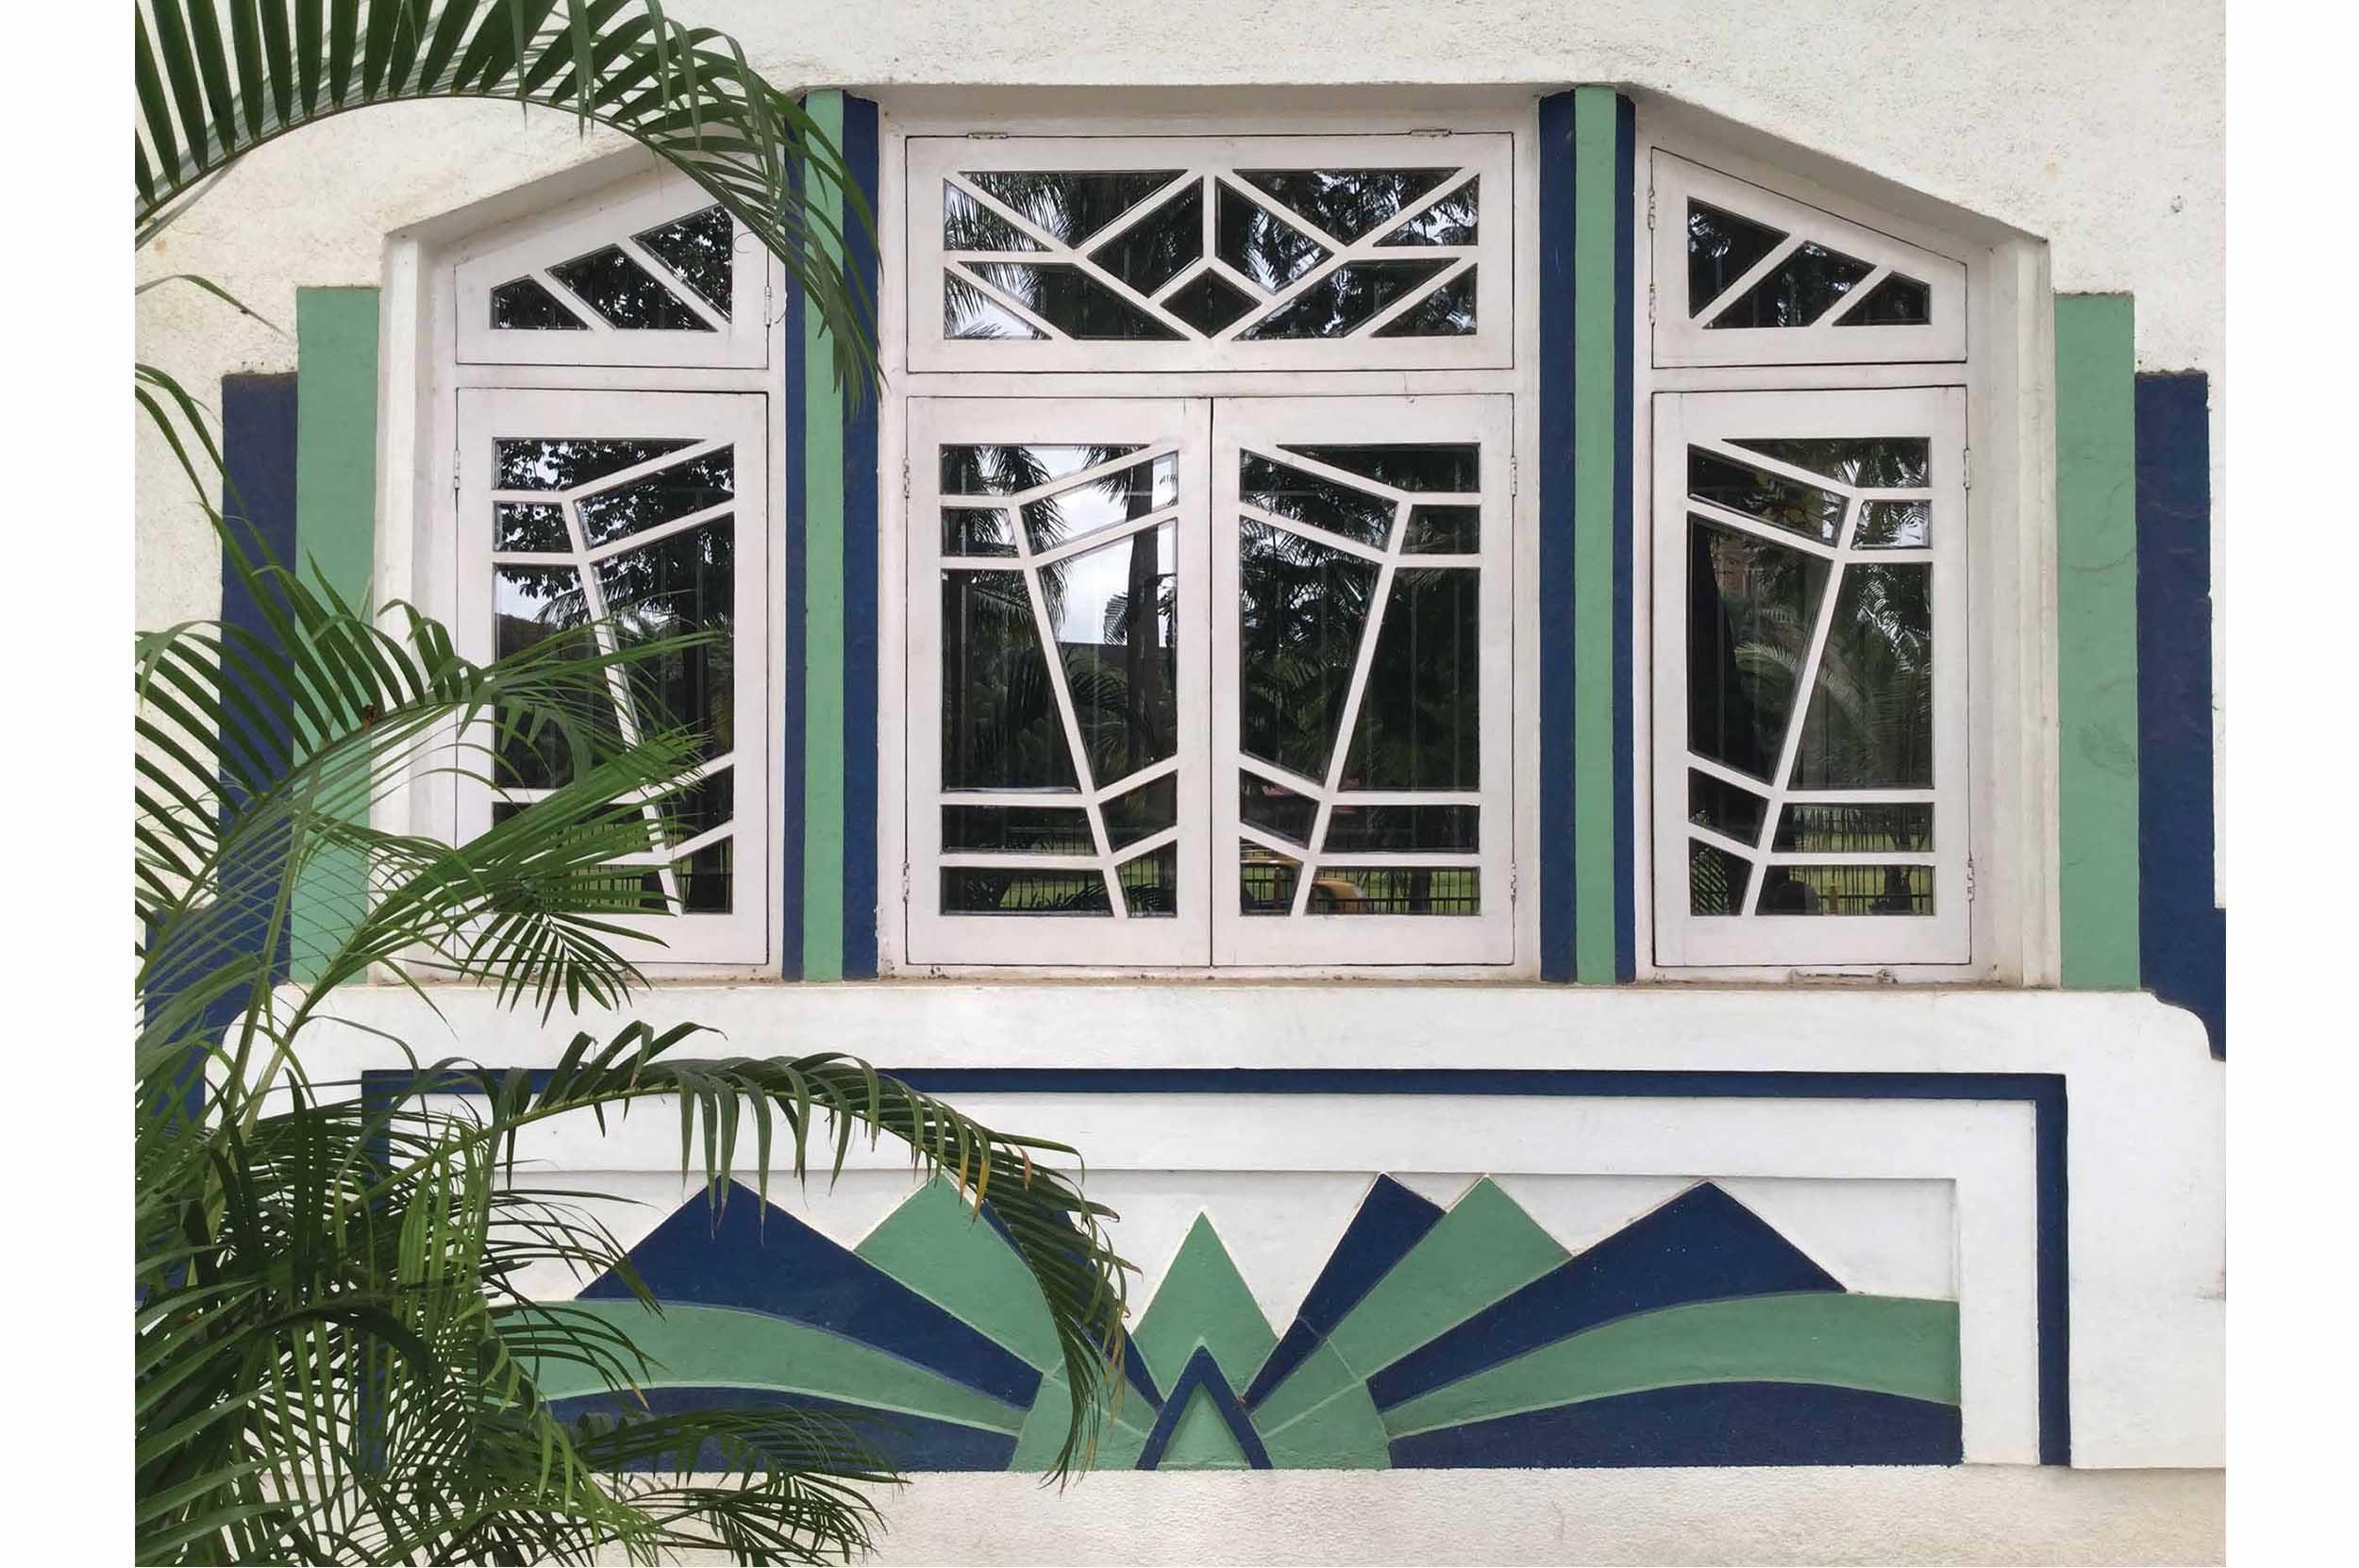 Detailed view of ground floor window on Rajjab Mahal, Oval Maidan